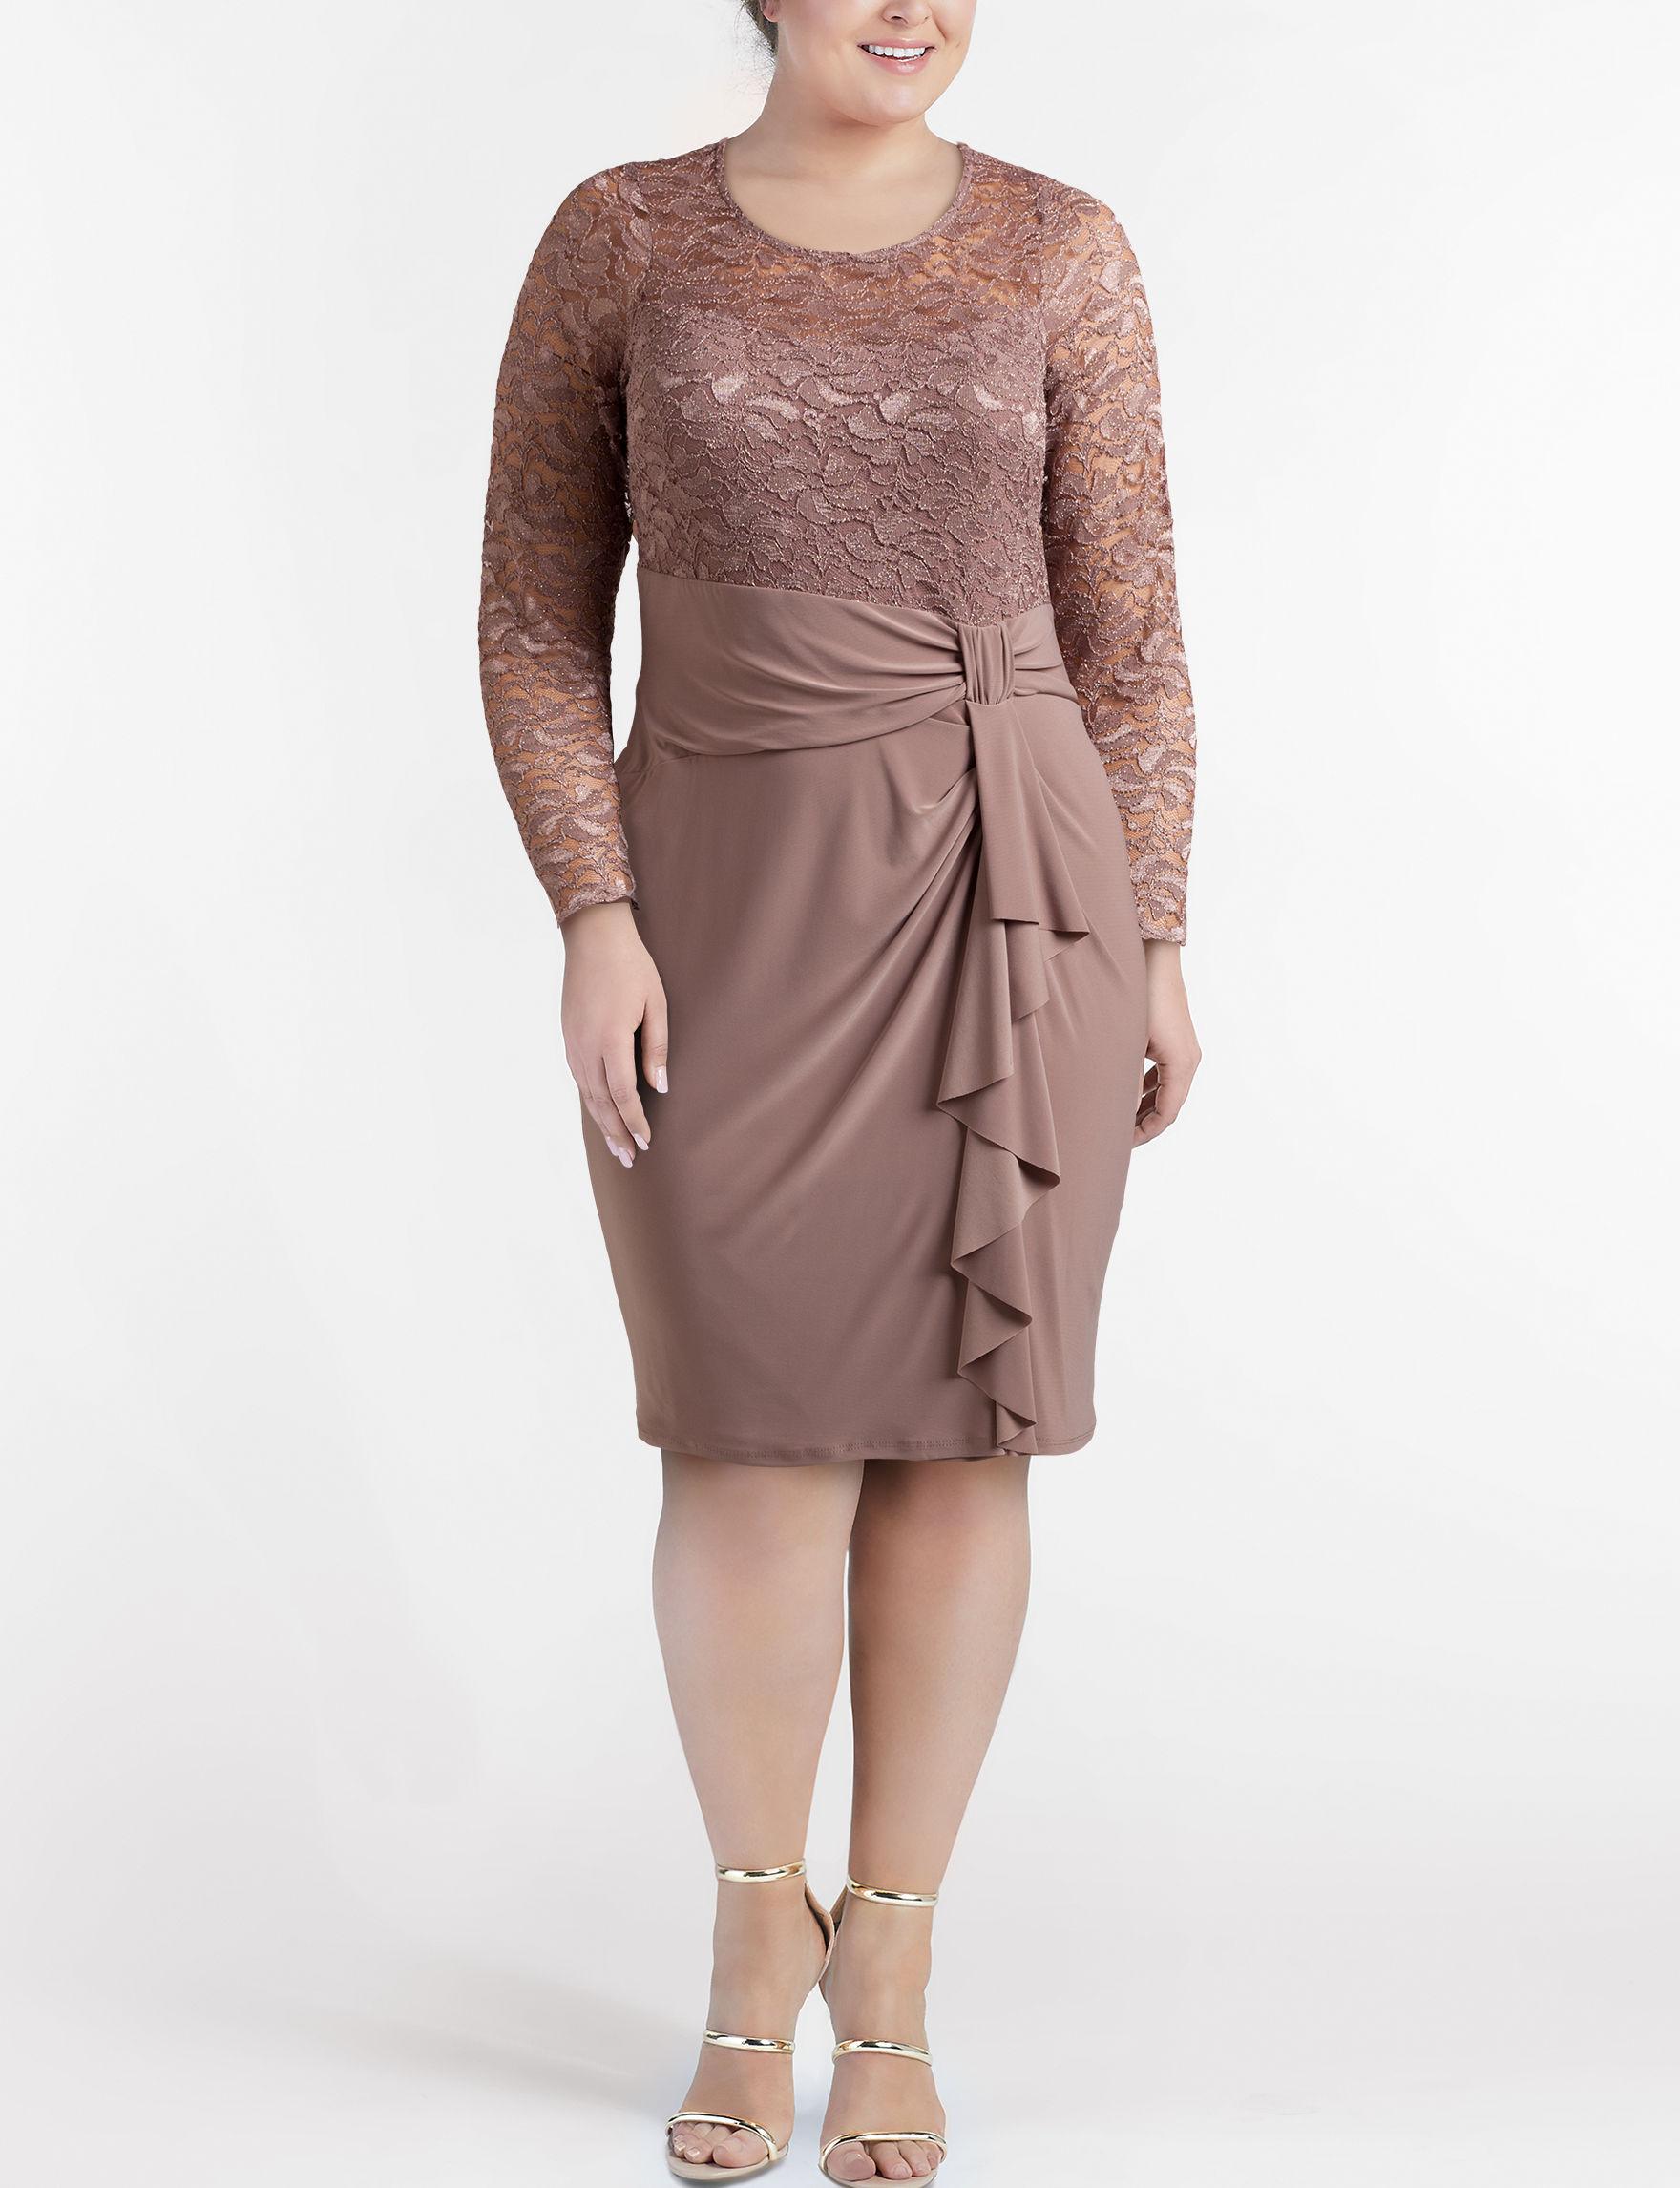 Marina Mocha Cocktail & Party Evening & Formal Sheath Dresses